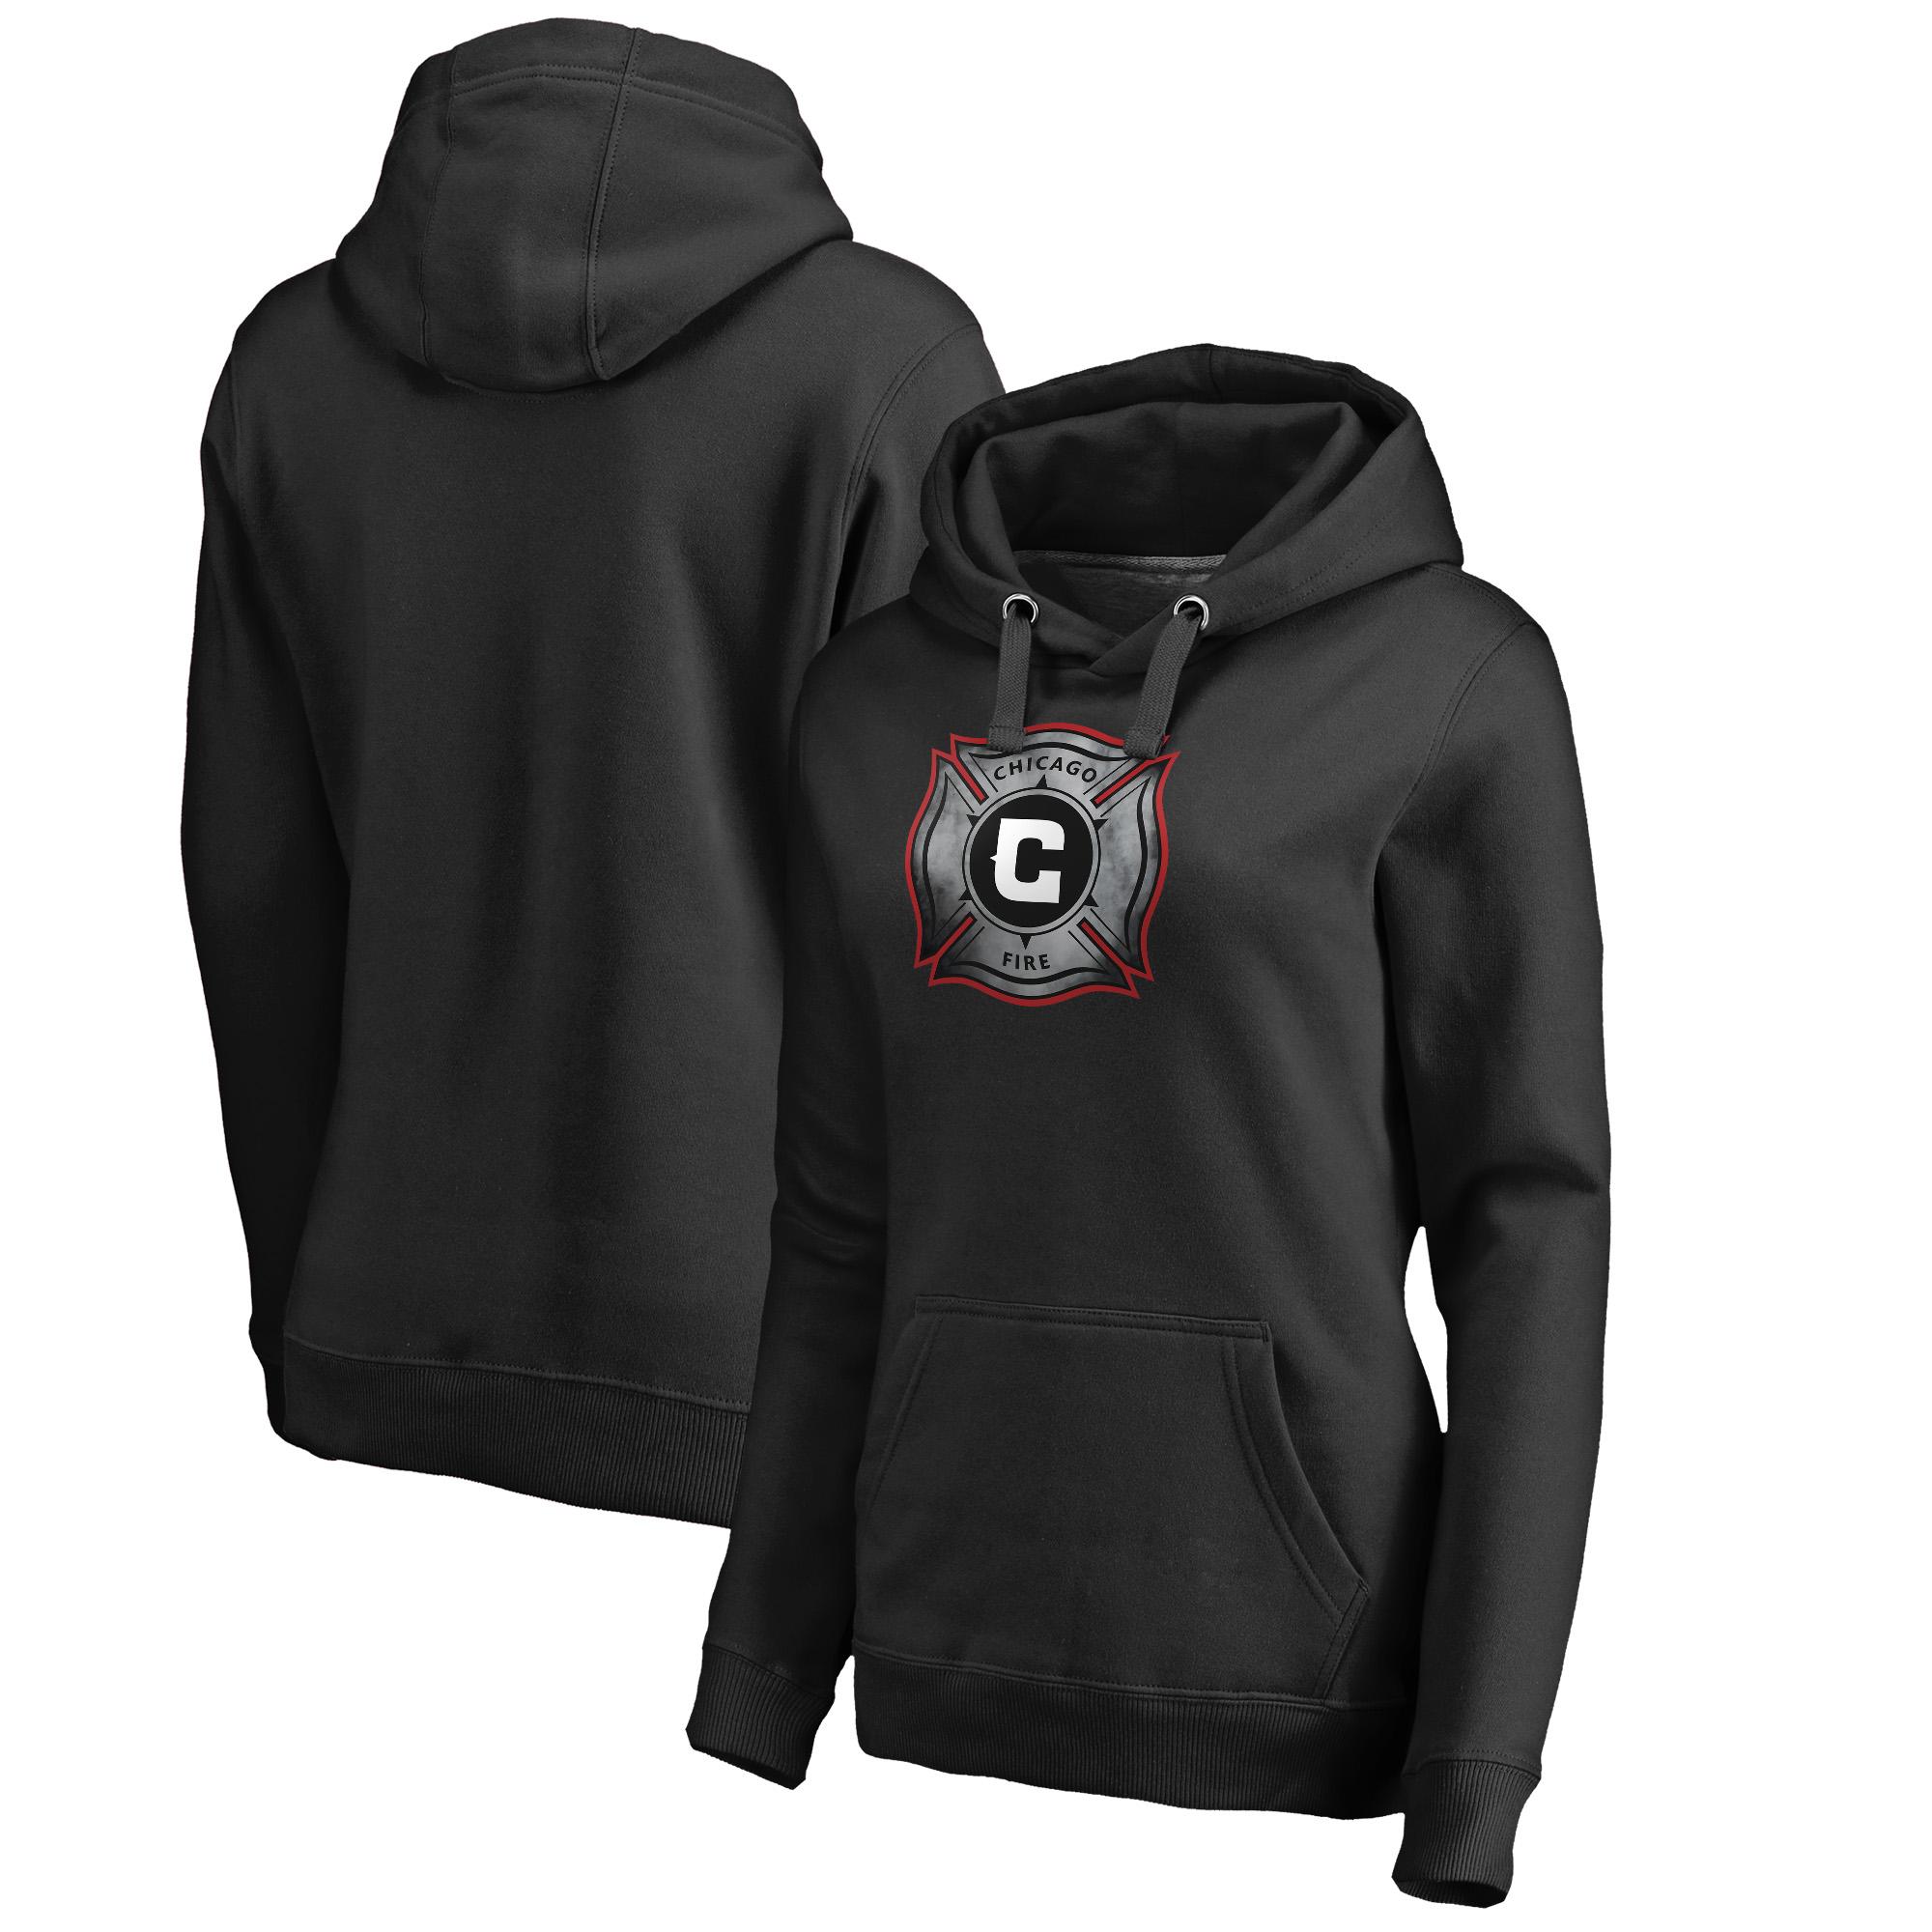 Chicago Fire Fanatics Branded Women's Core Smoke Pullover Hoodie - Black